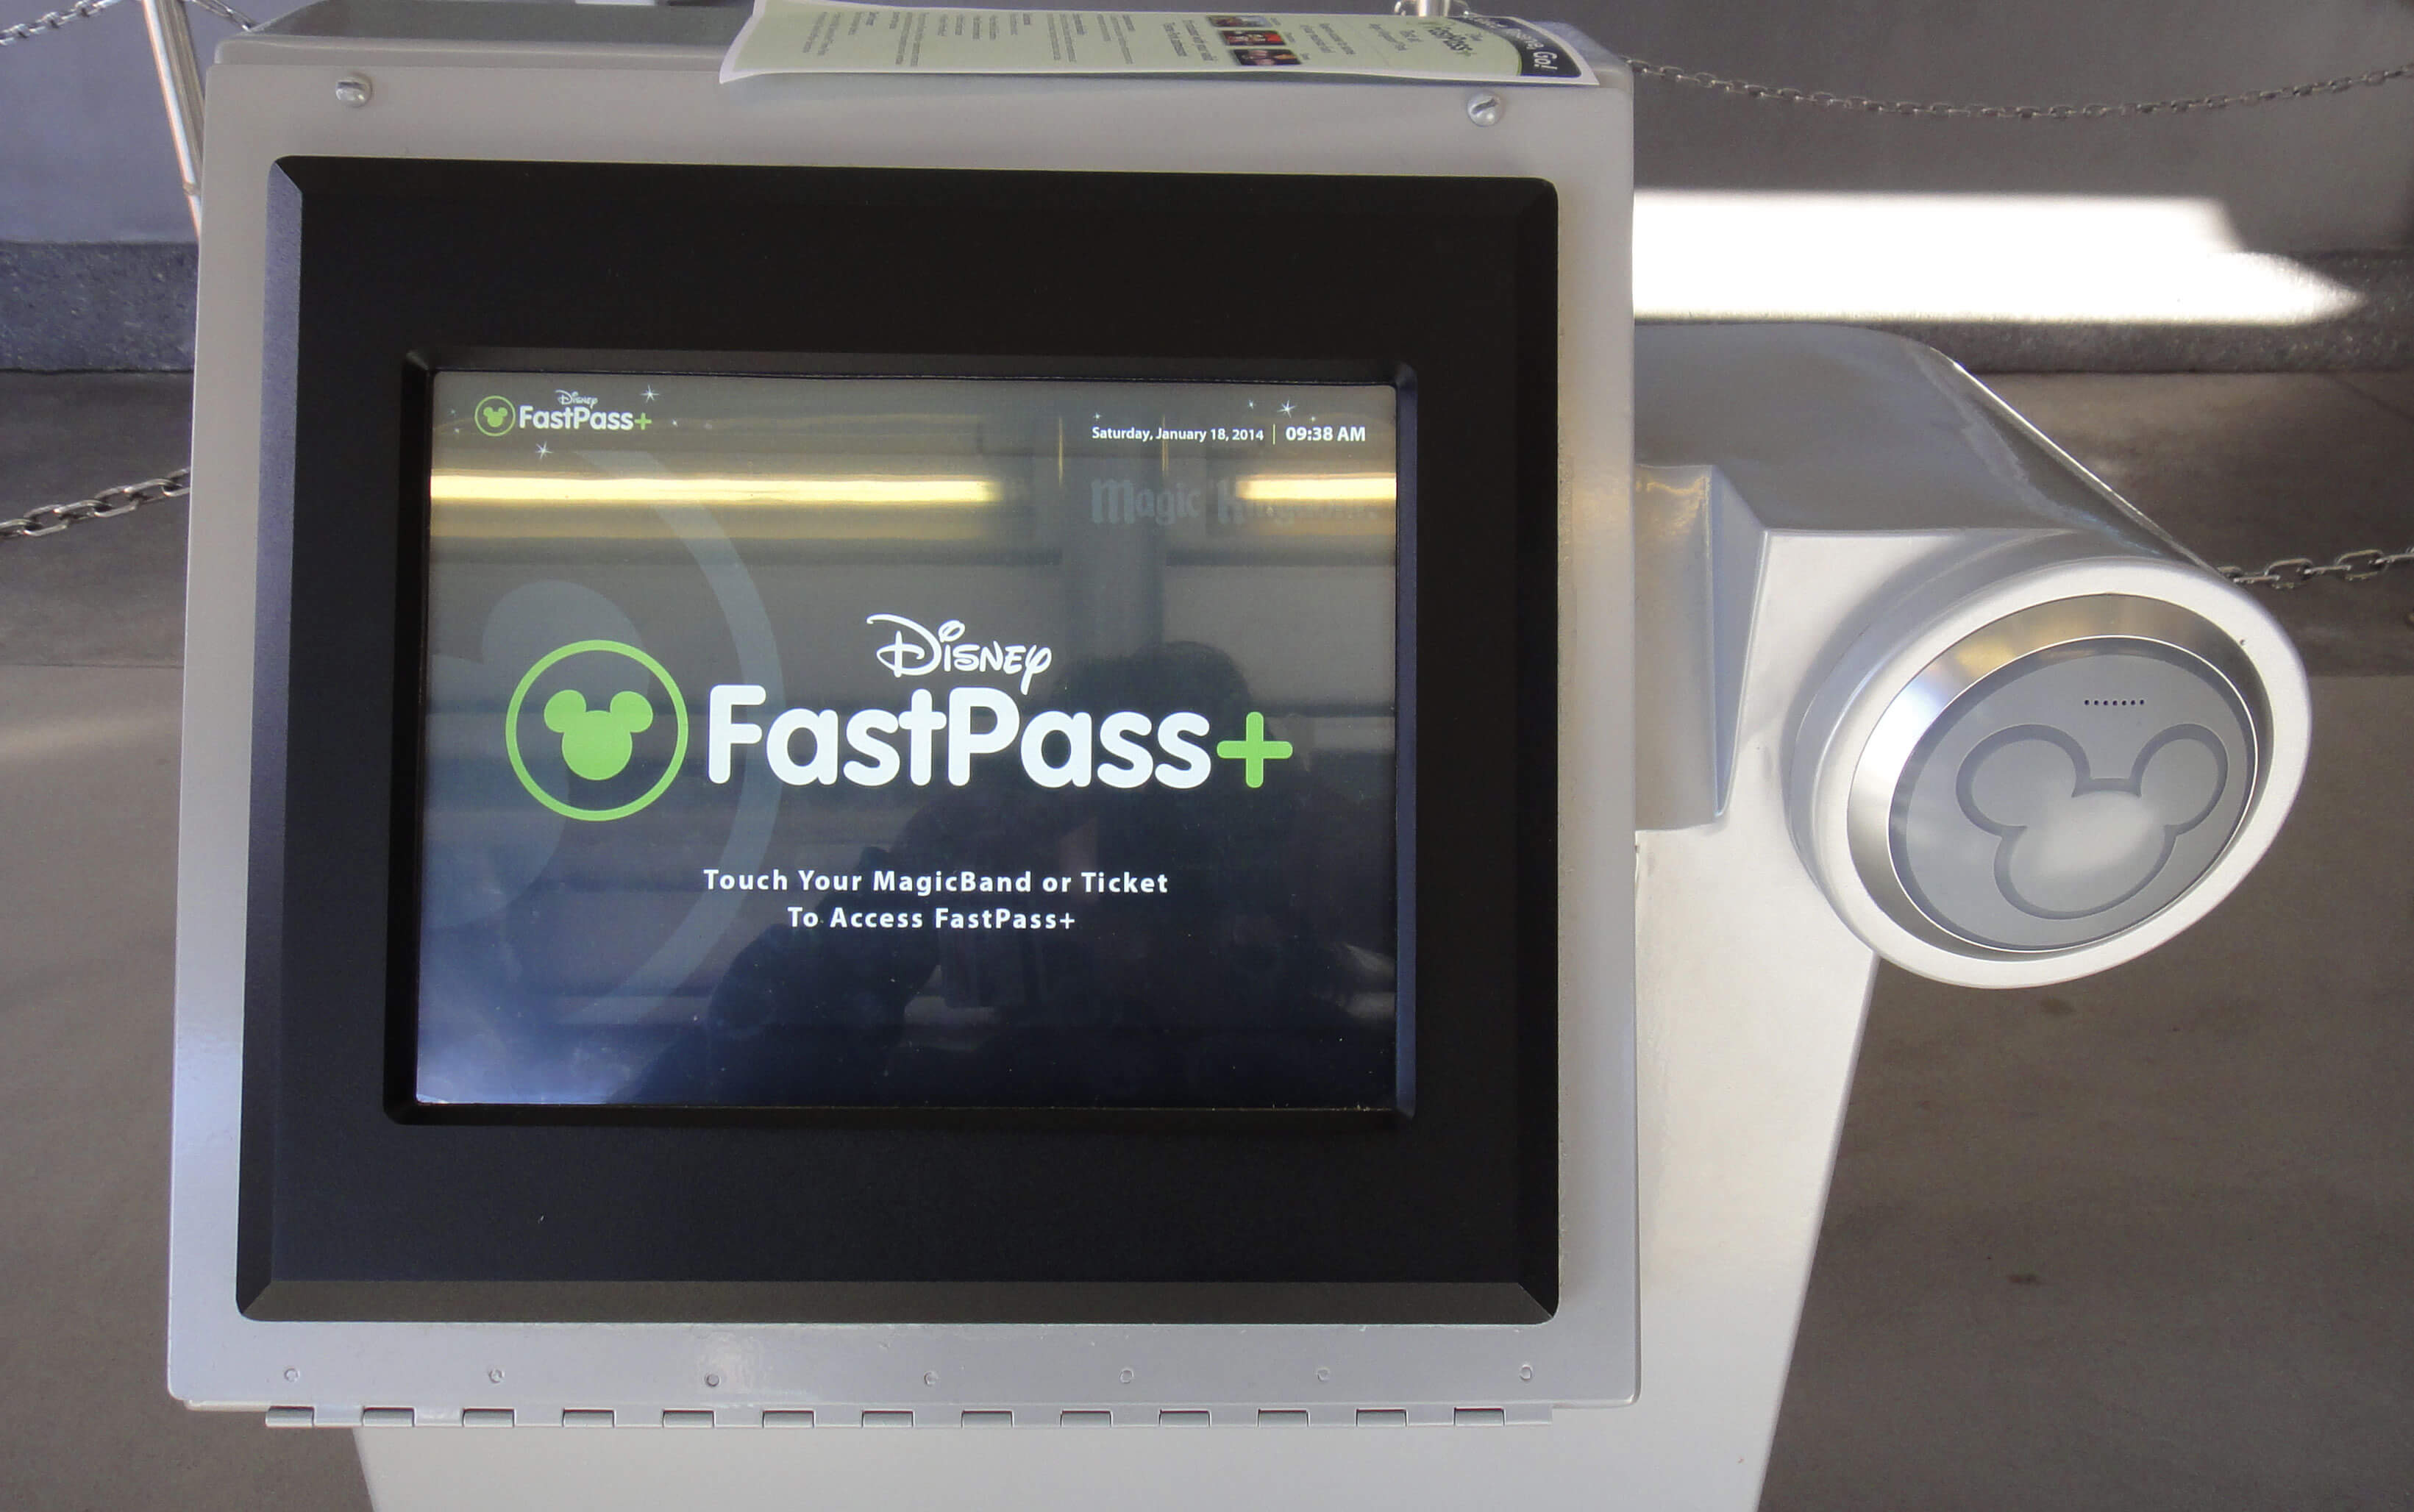 How To Use Disneys Fastpass In Park Kiosks